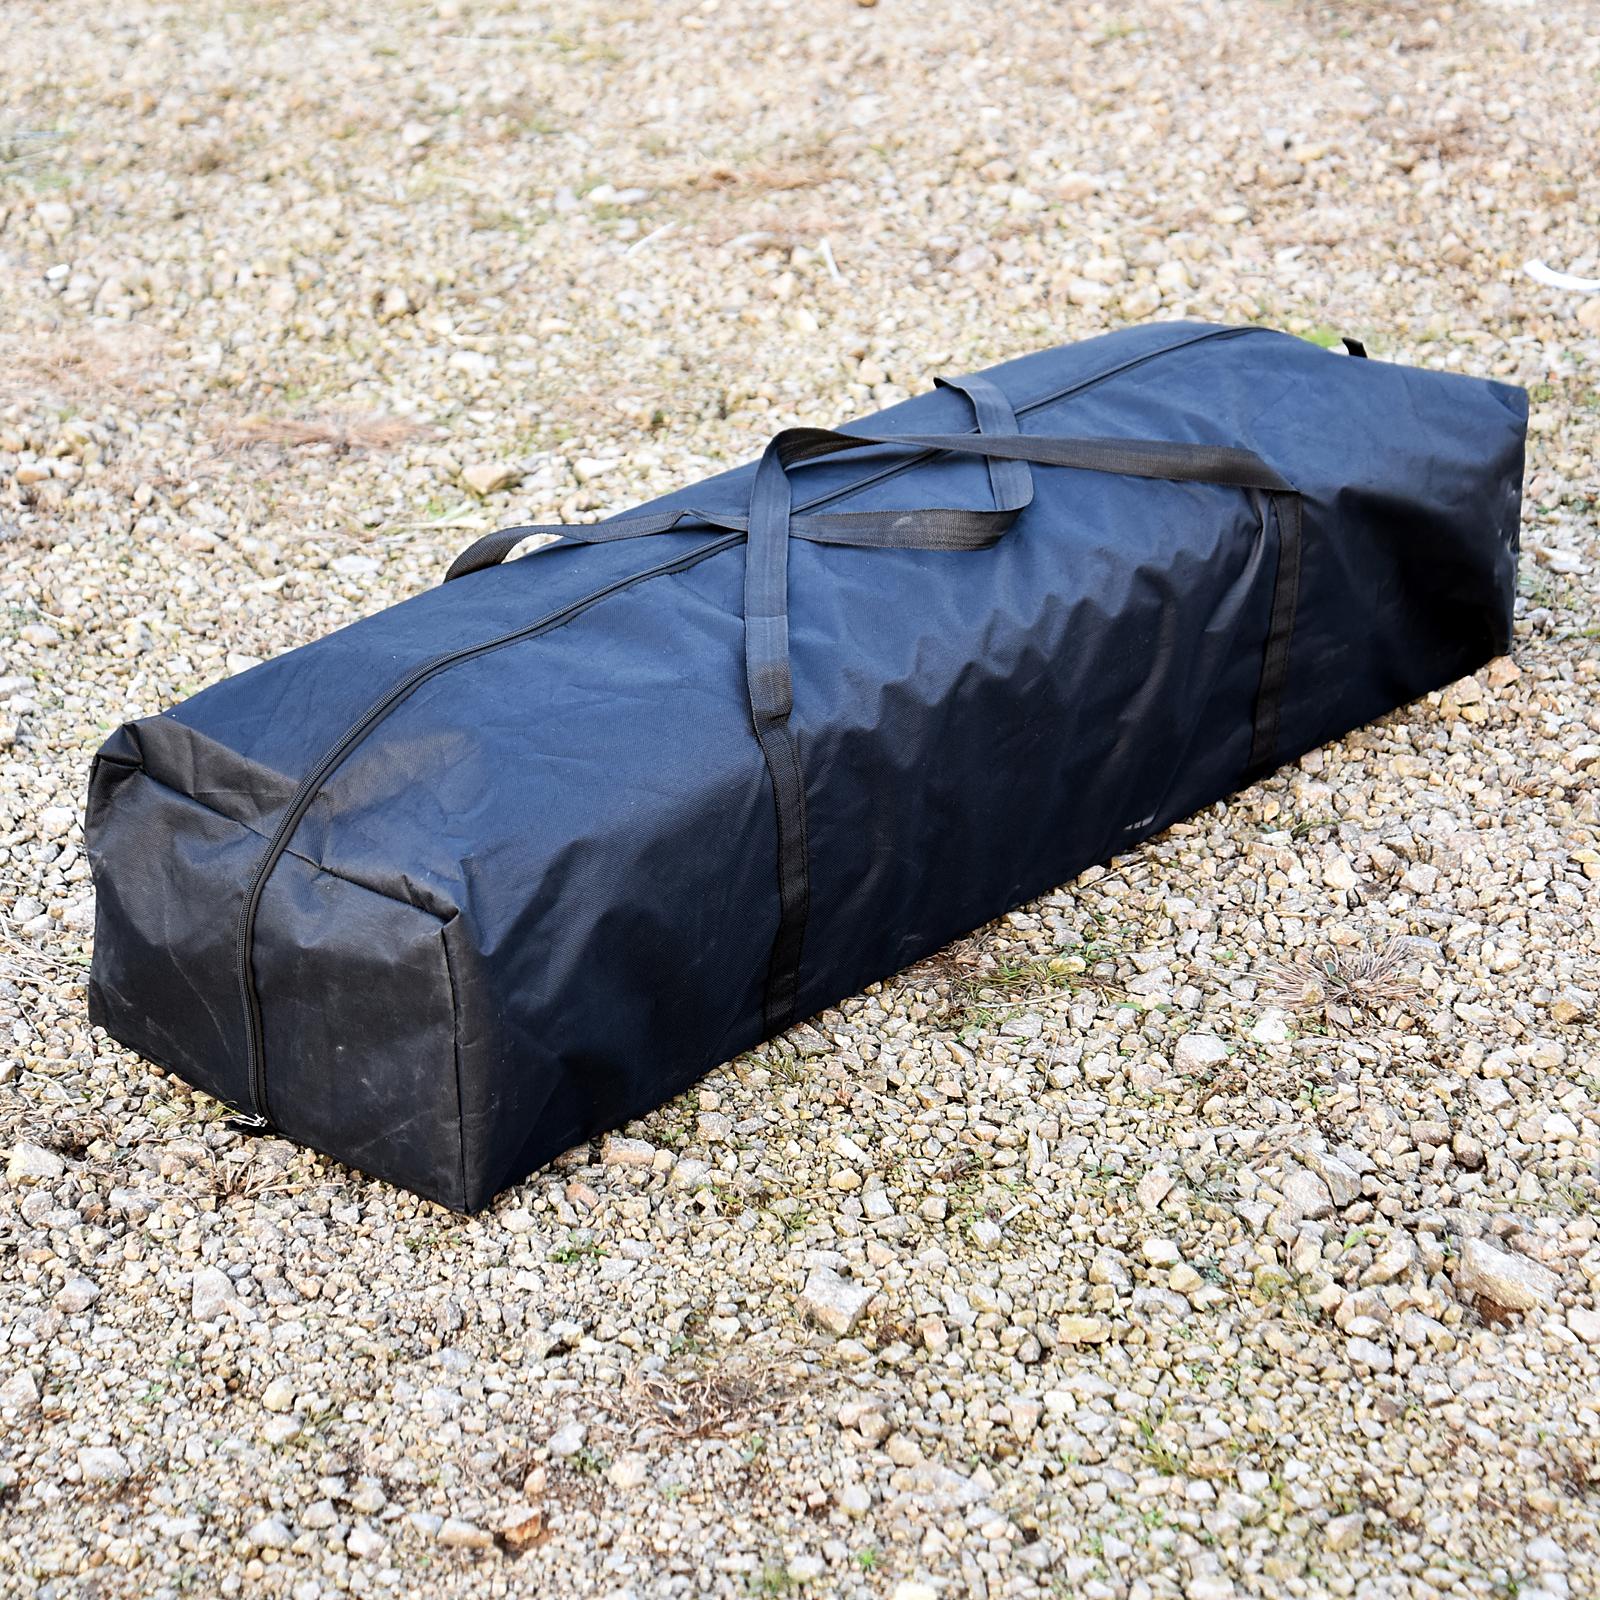 Outdoor-10-039-x20-039-EZ-POP-UP-Gazebo-Wedding-Party-Tent-Canopy-Folding-w-Carry-Bag thumbnail 47